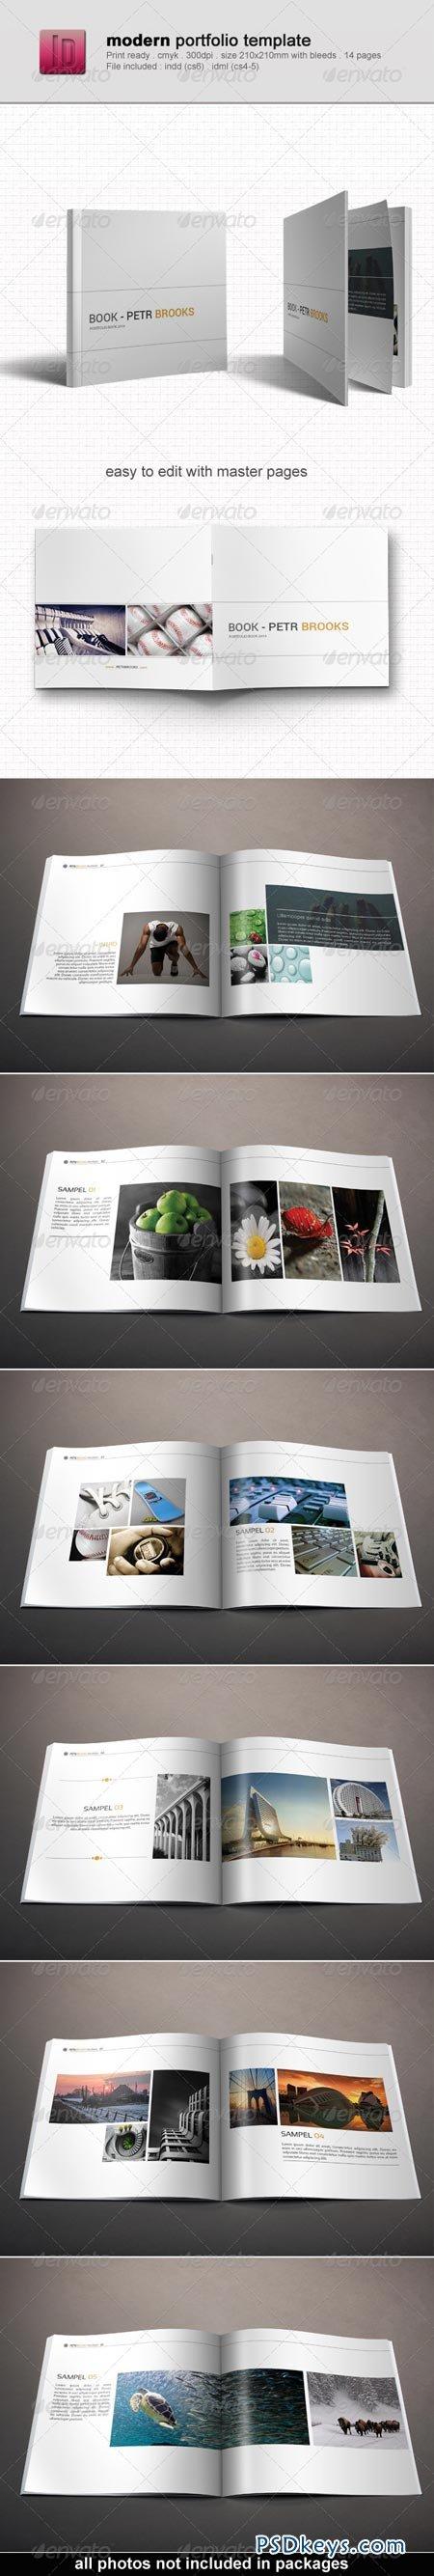 Modern Portfolio Template 6592214 Free Download Photoshop Vector Stock Image Via Torrent Zippyshare From Psdkeys